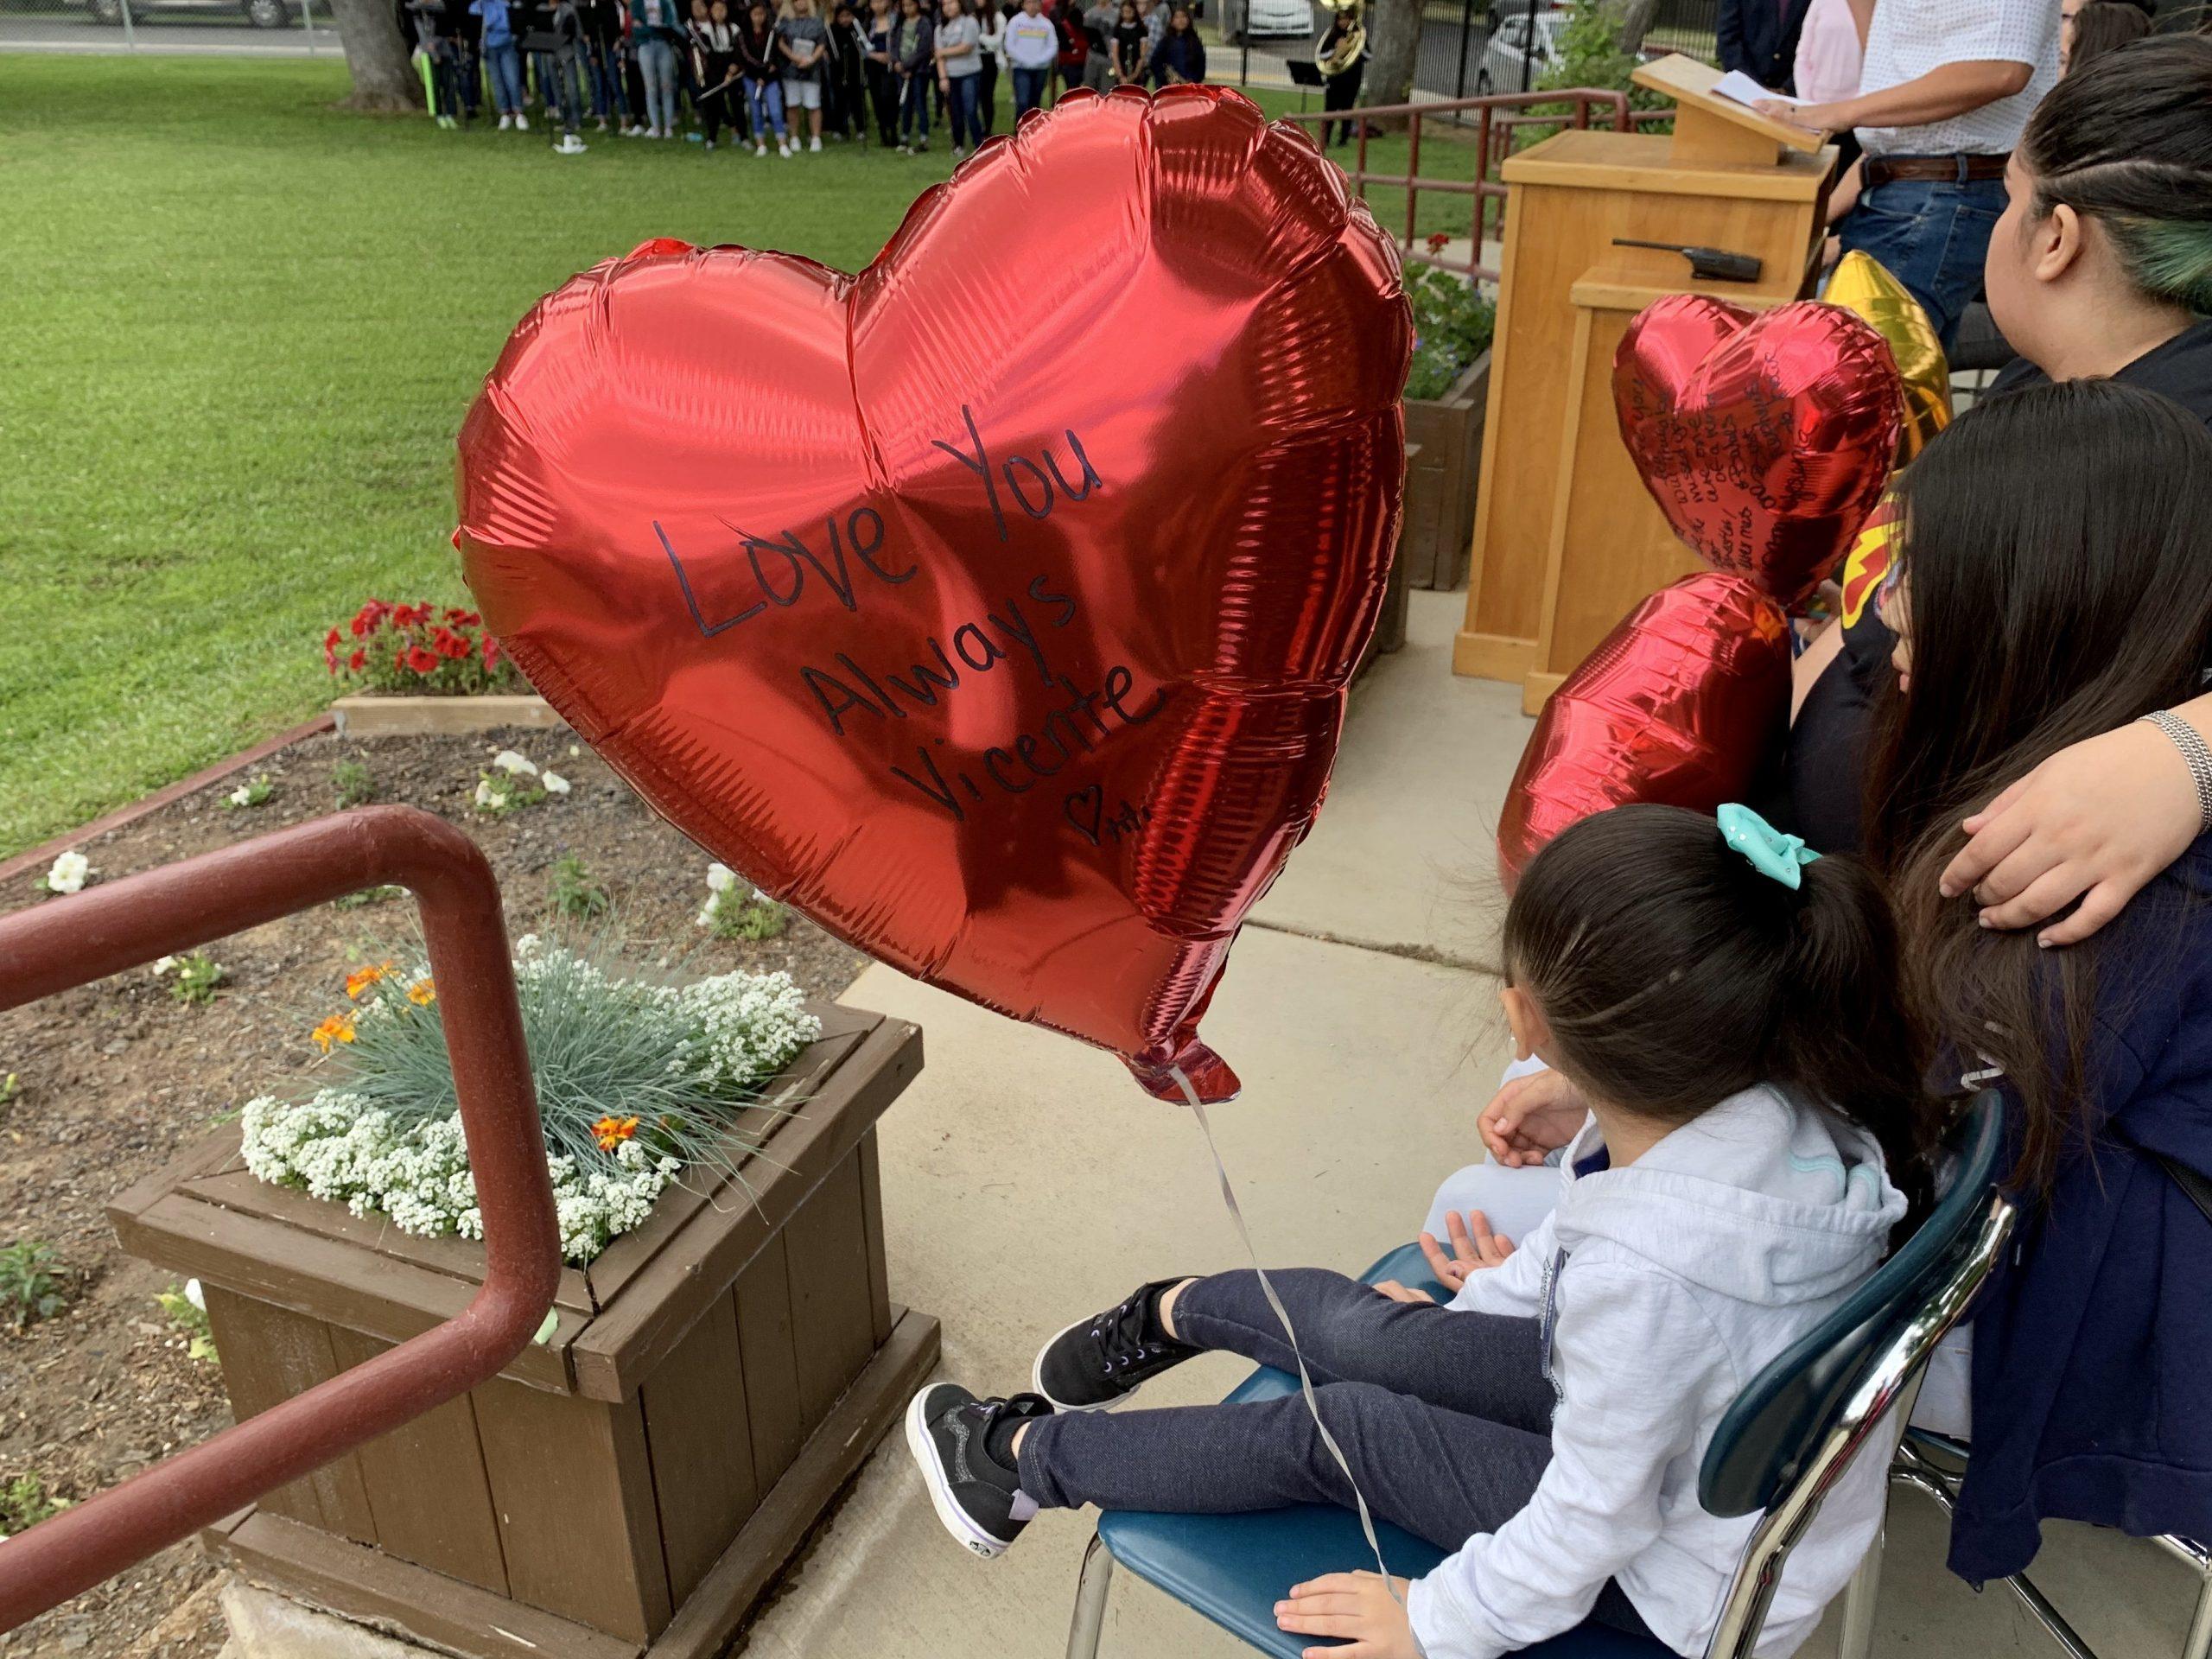 Hoover School Student Honored During Memorial Service Regarding Merced City School District Calendar